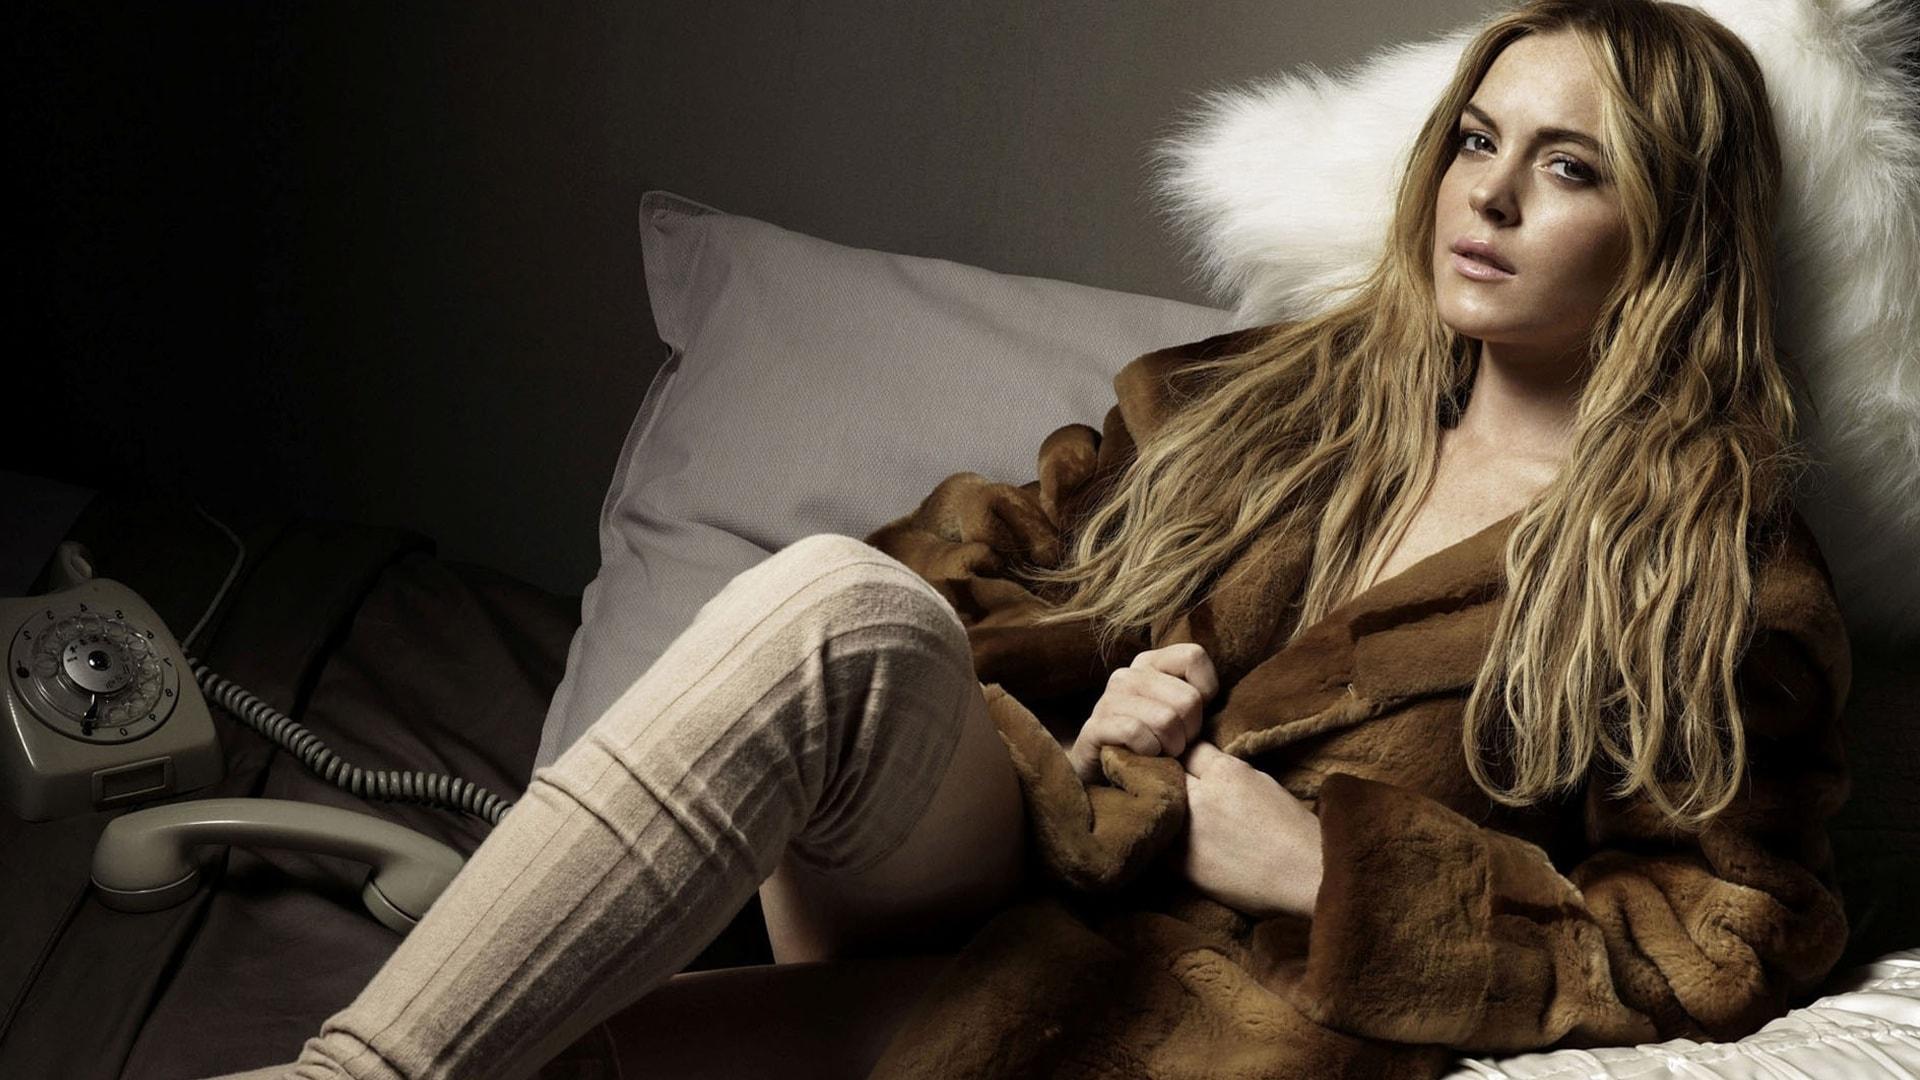 Lindsay Lohan HD